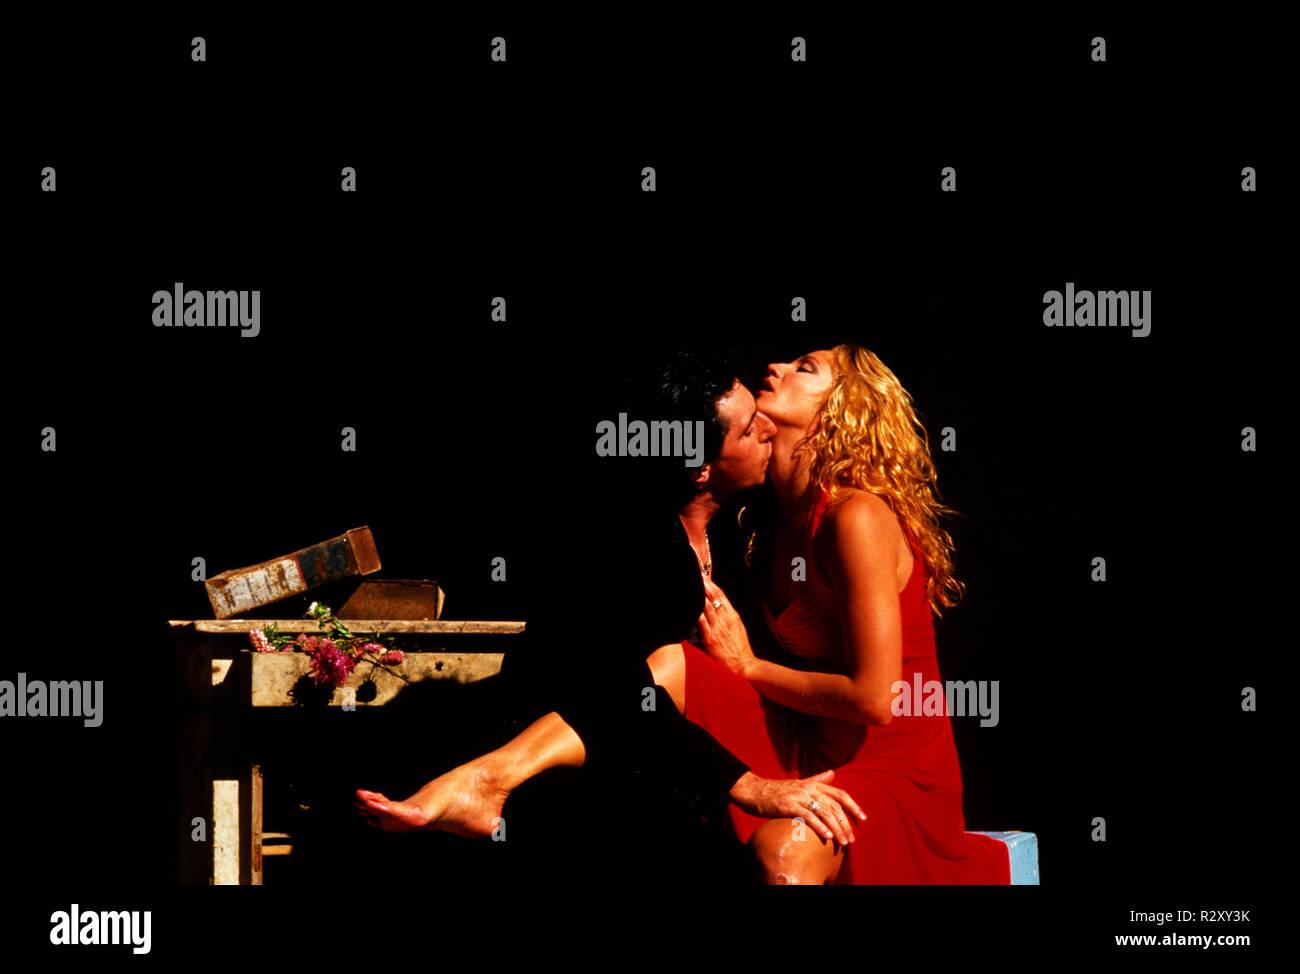 Rachel bilson by craig de cristo hq photo shoot,Abigail duhon camp cool kids premiere in universal city Porn images Wrenn Schmidt Nude  Outcast - 2016 s01e09  HD,Nora mork lekket bilder